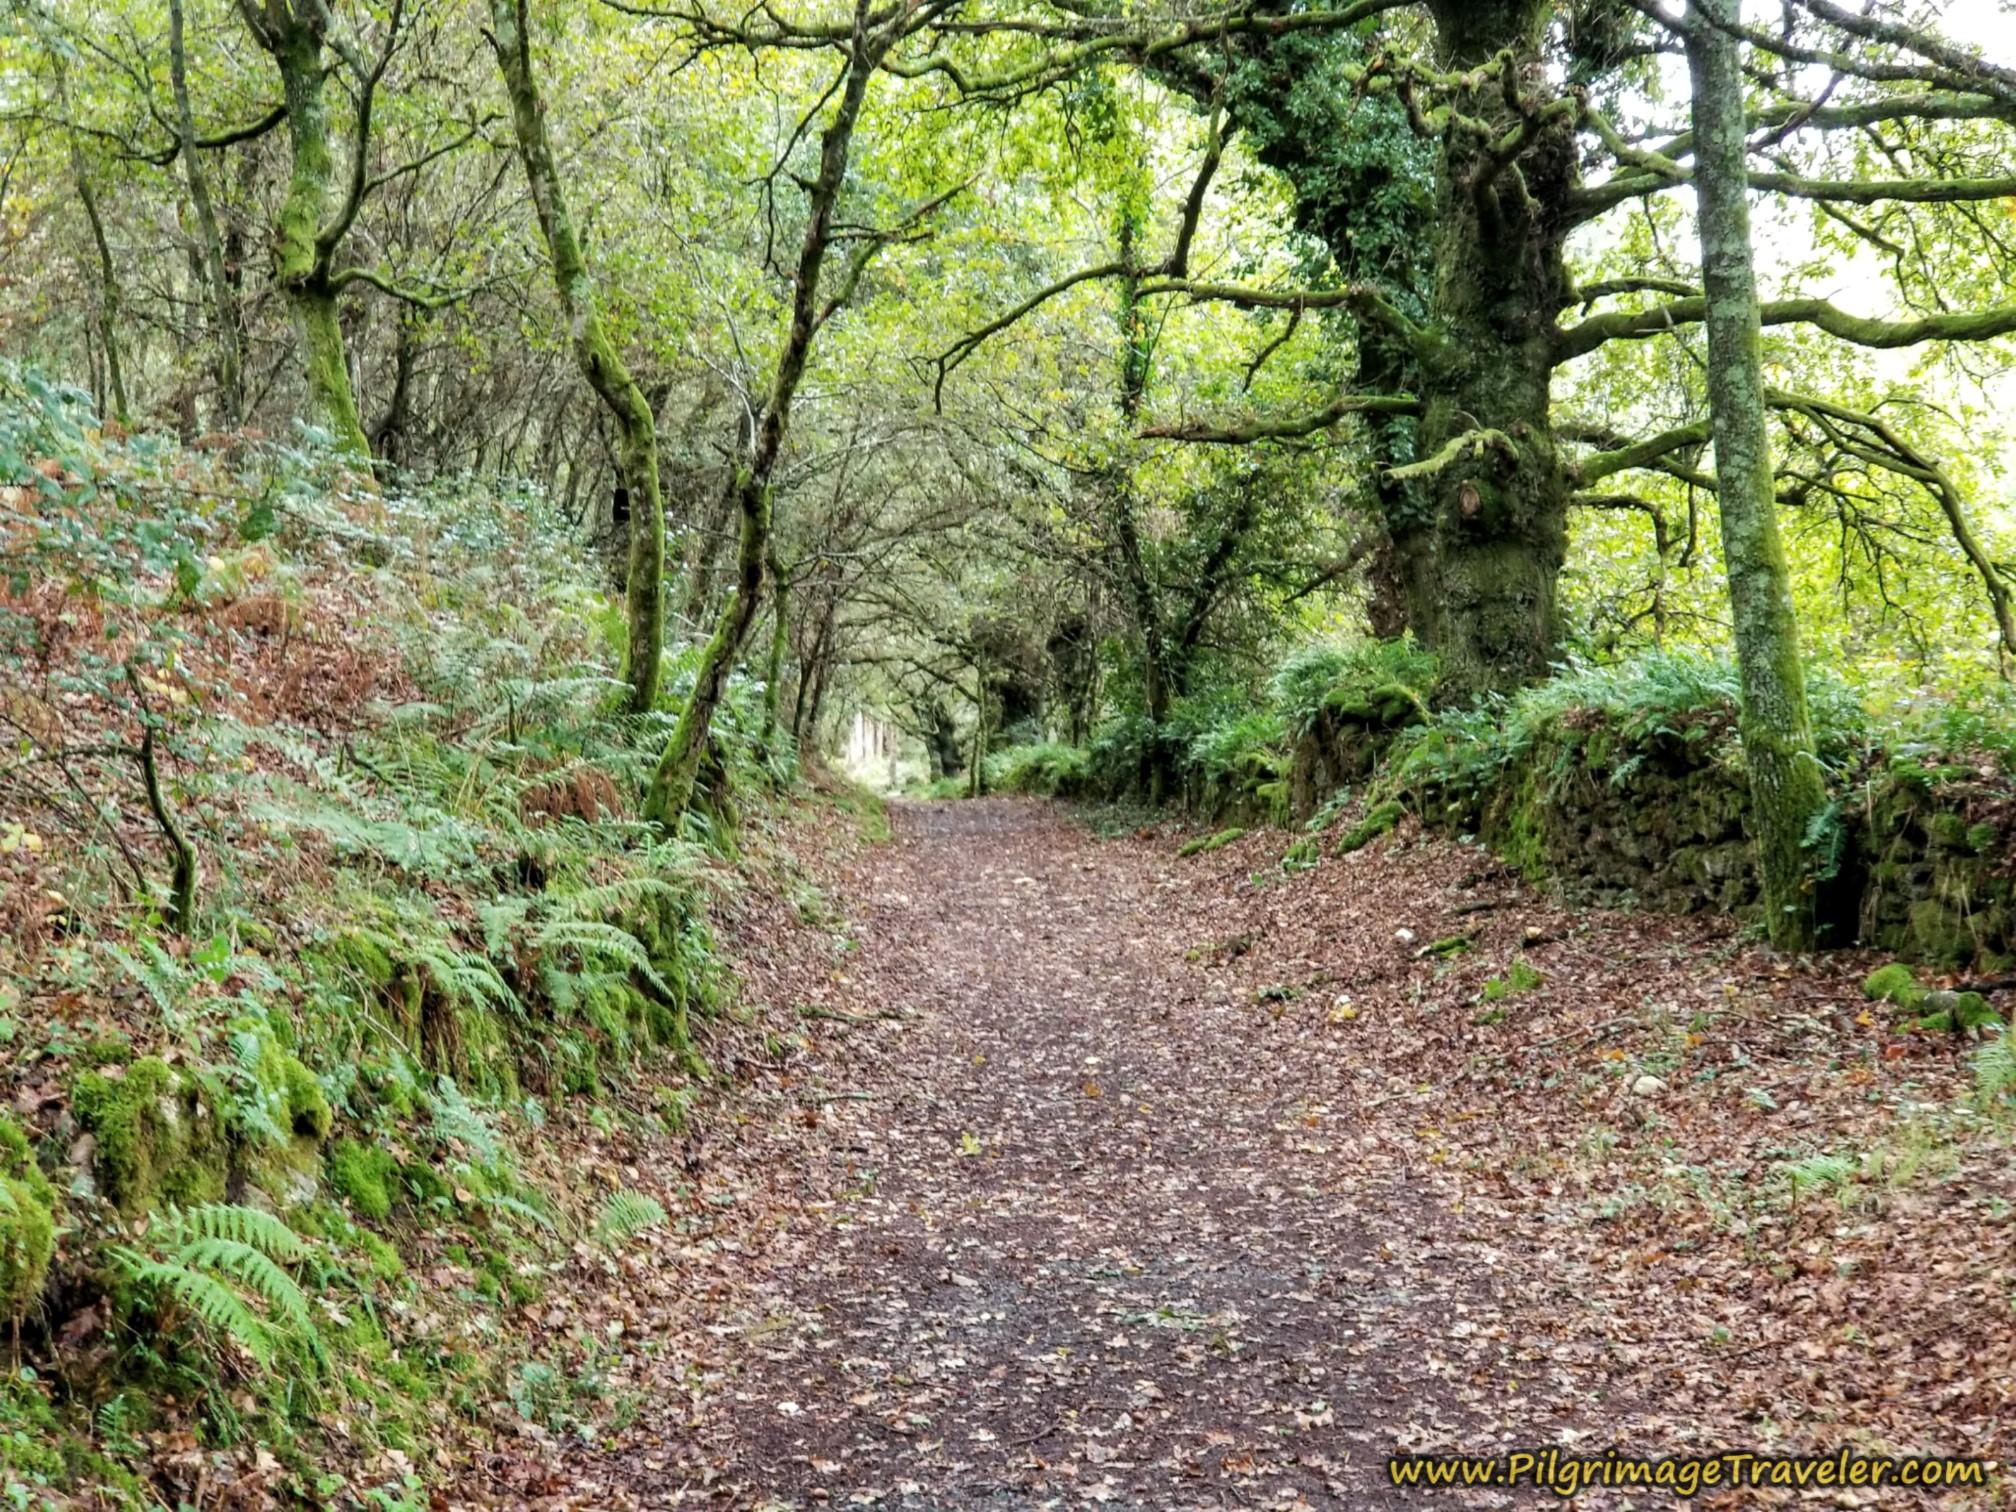 Short Forest Walk to Silleda Industrial Park